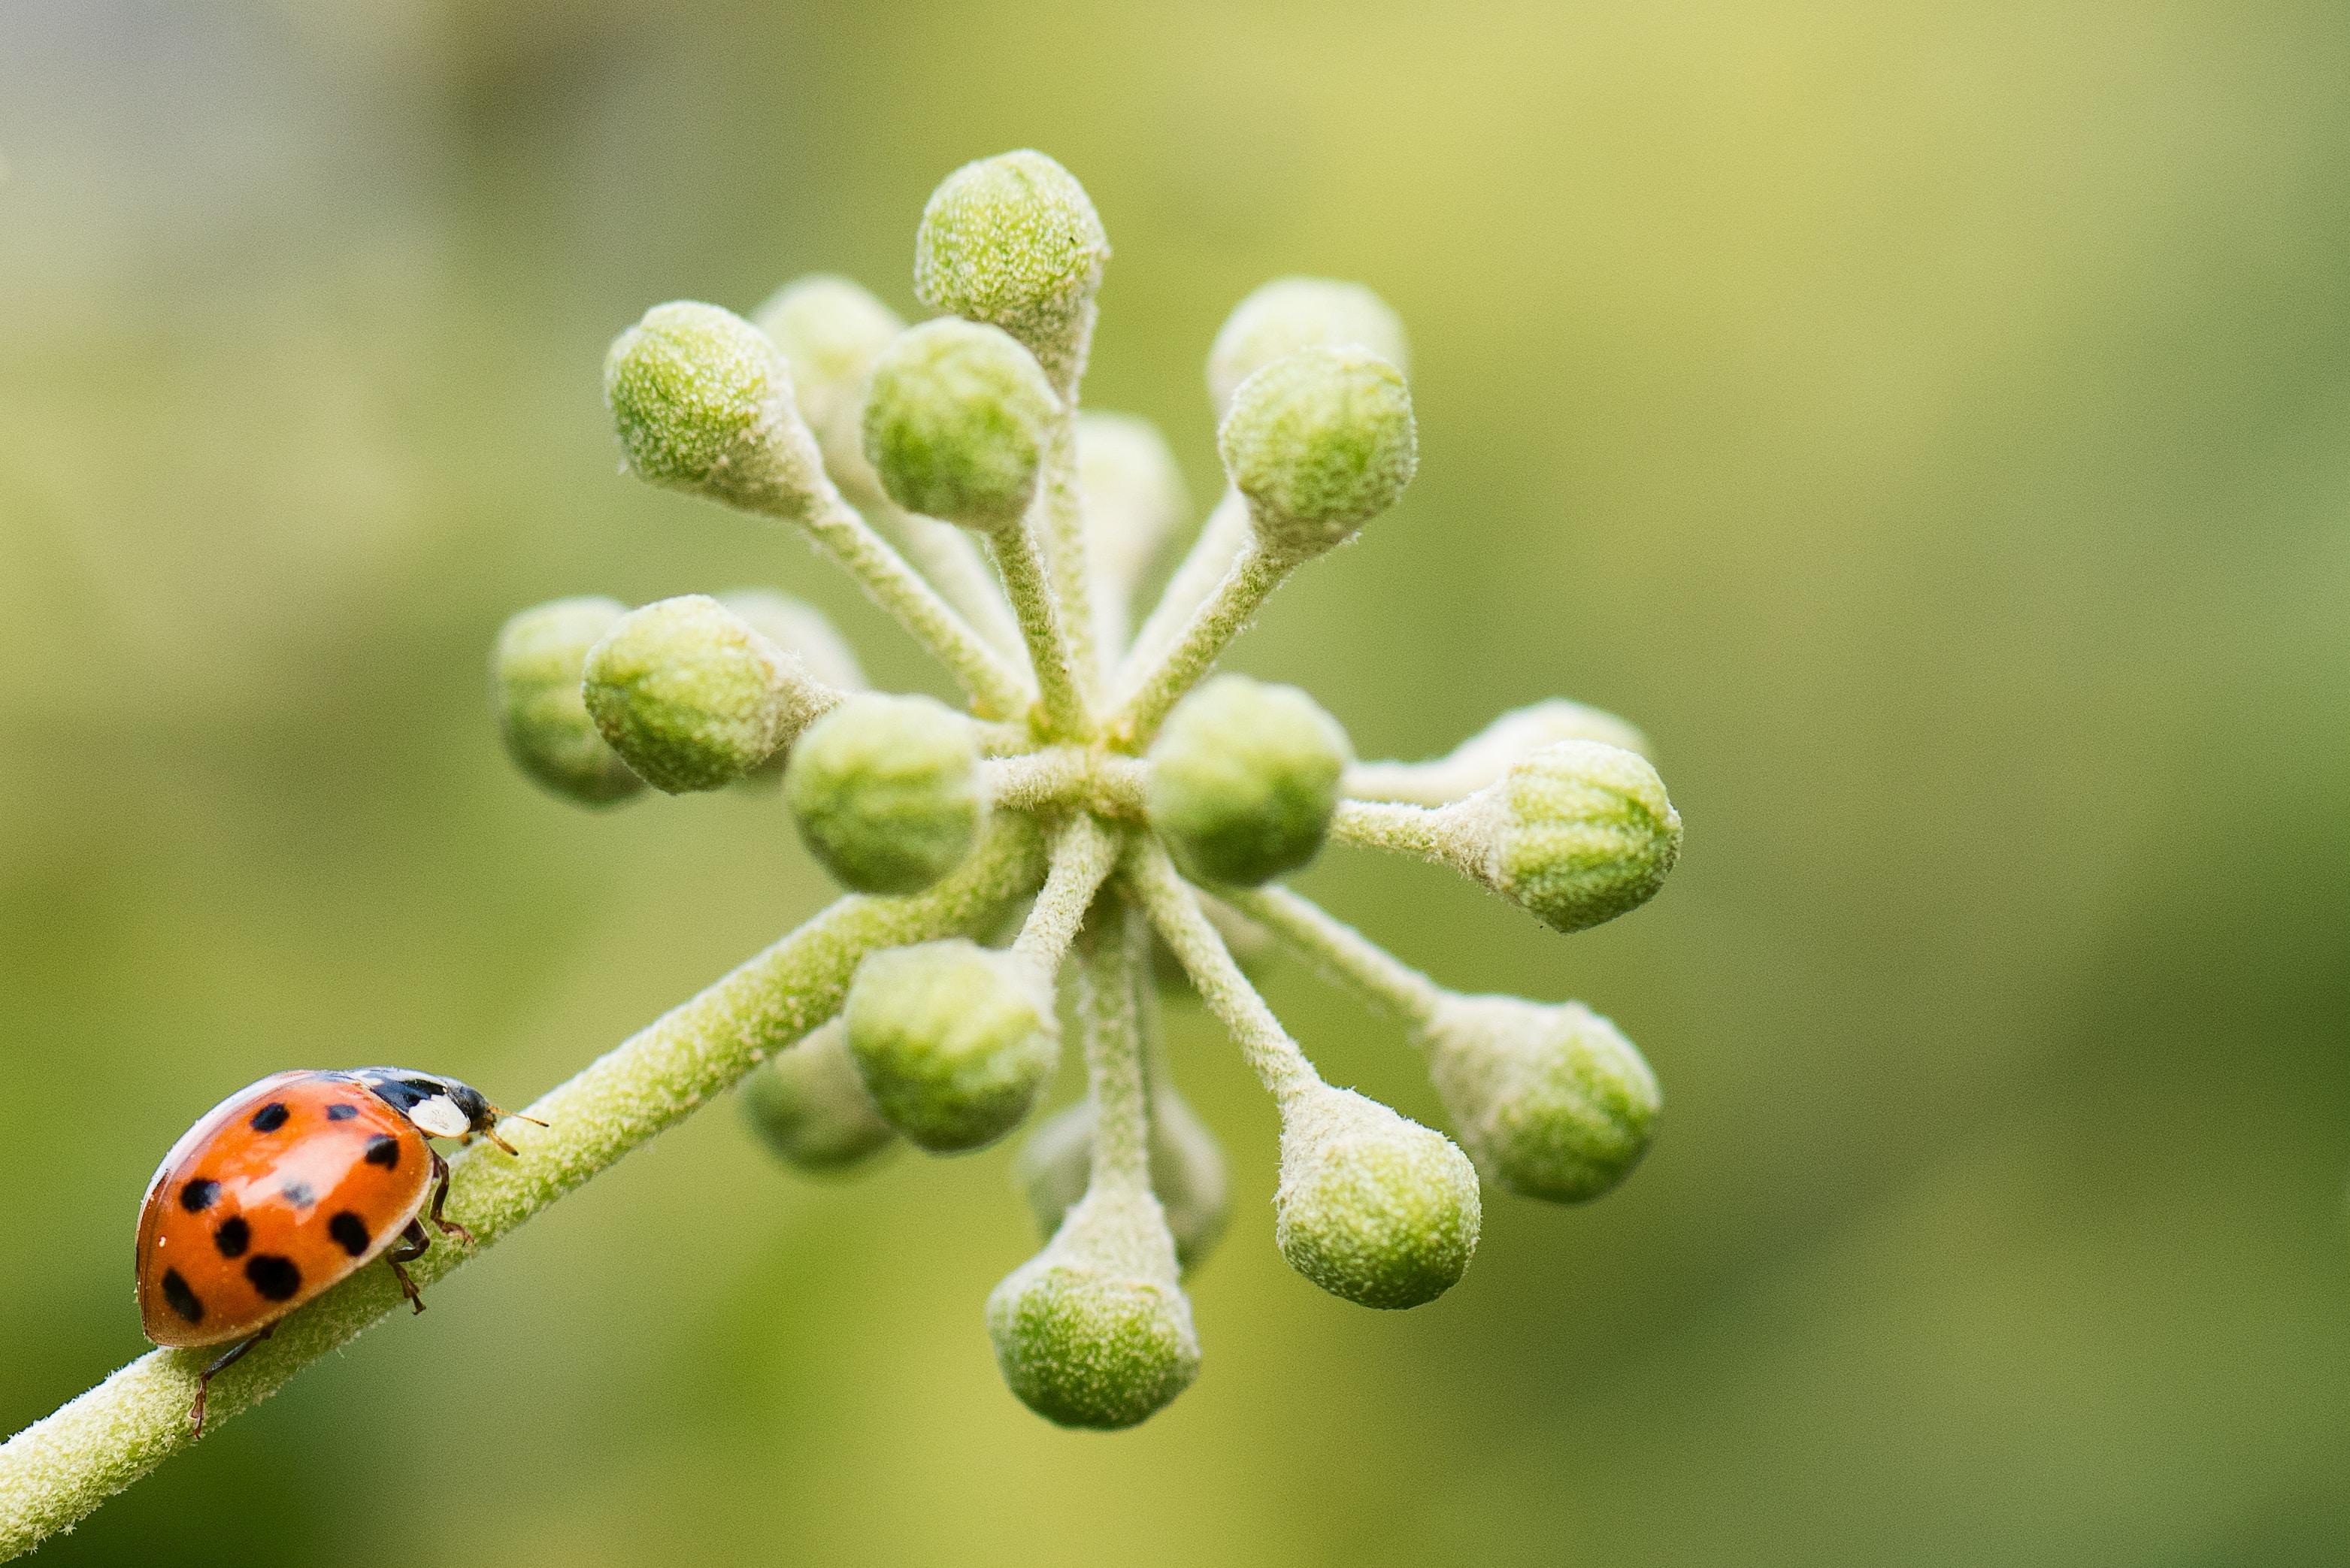 tilt-shift lens photography of bug on plant